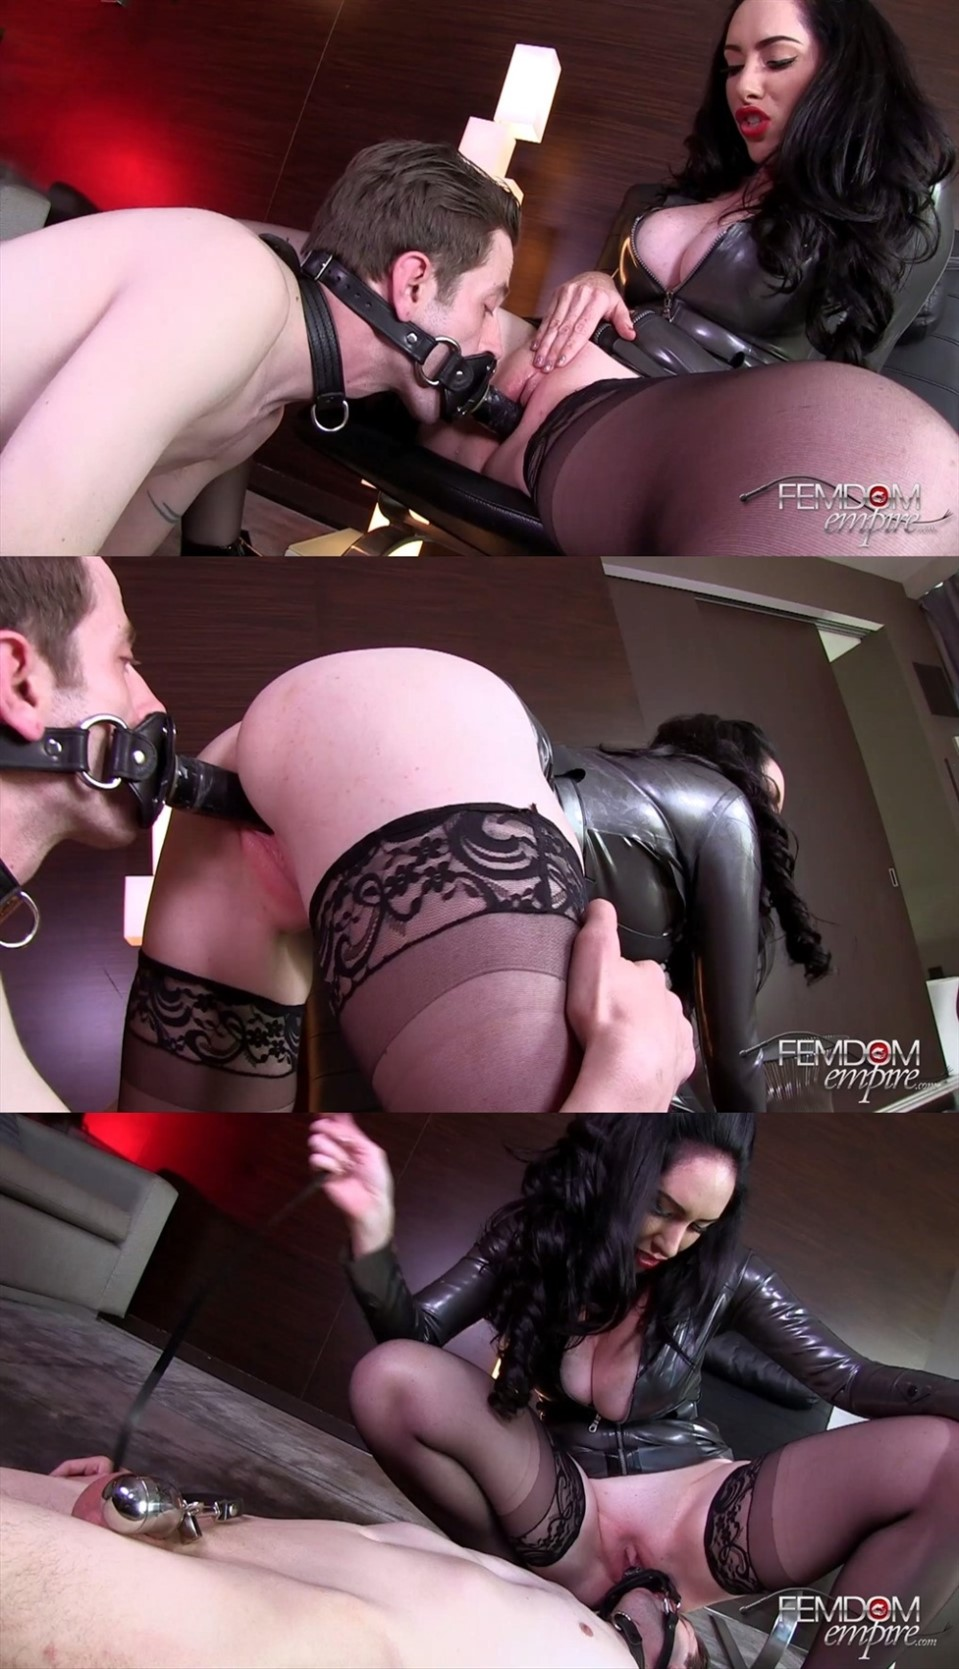 [Full HD] Bella Maree - Useless Slave Cock Bella Maree - SiteRip-00:08:38   Live Dildo, Stockings, Face Fucked, DildoFace, Facesitting, Femdom - 497 MB